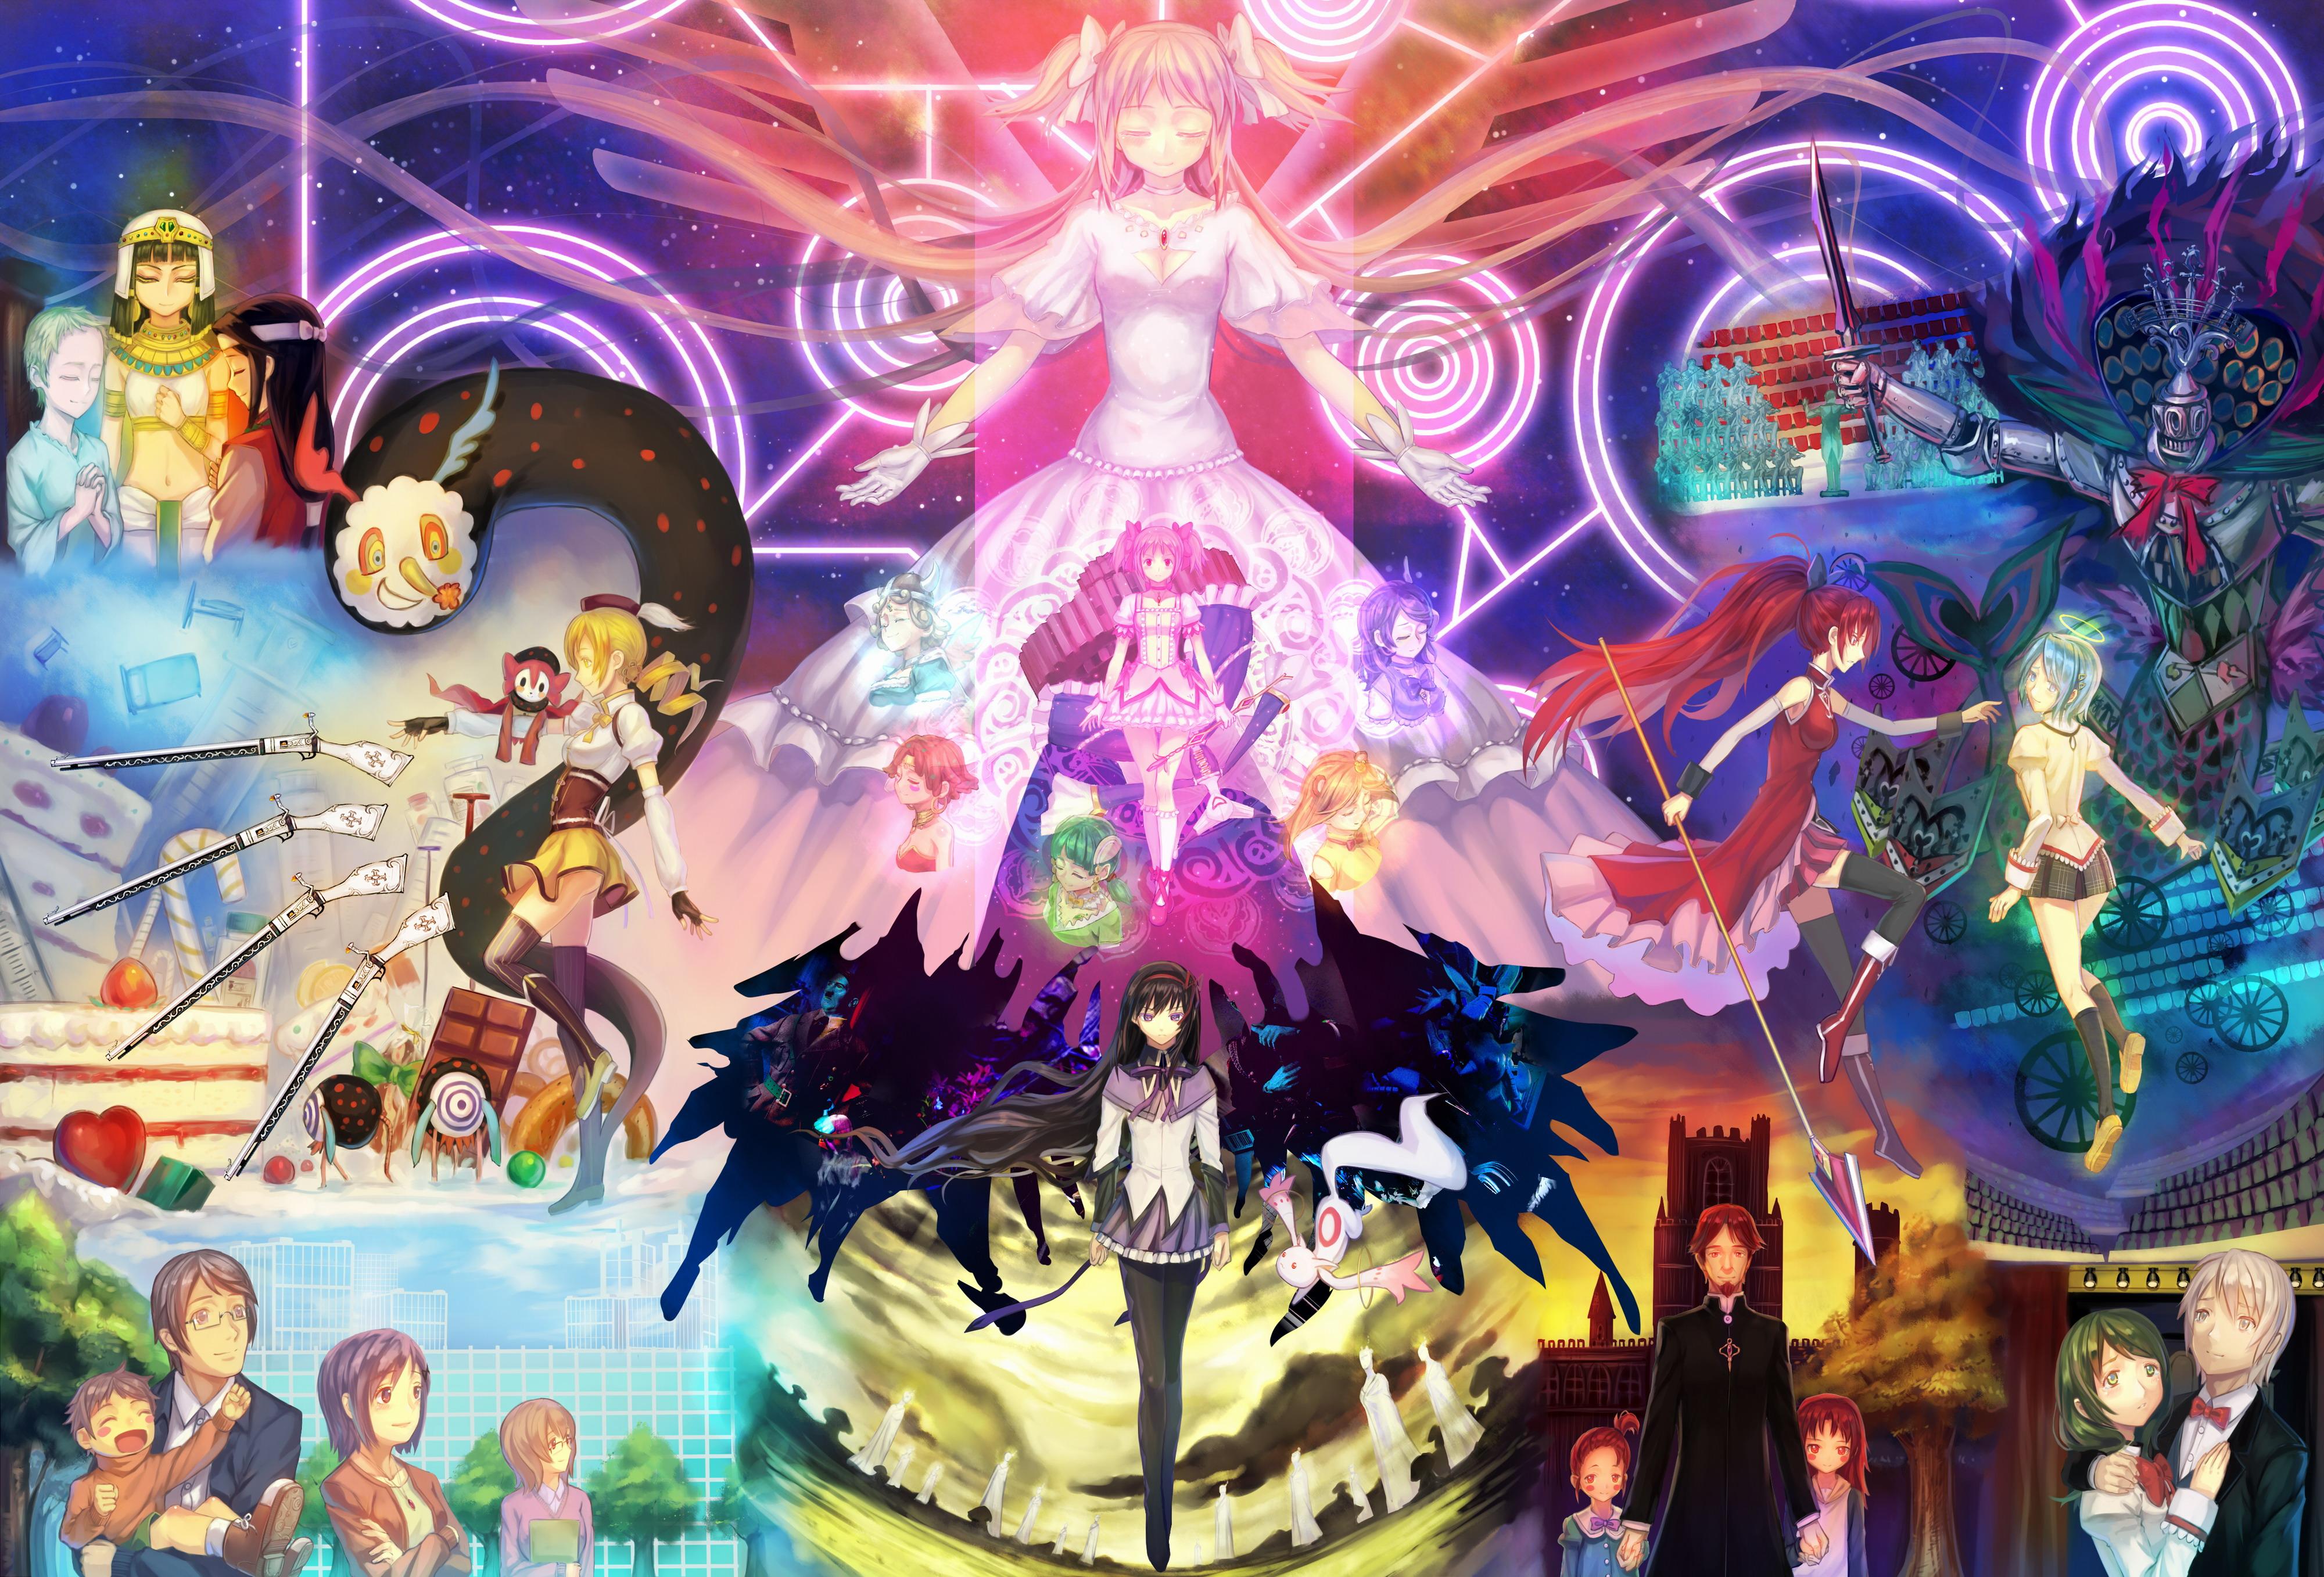 Homura Akemi Madoka Kaname Mami Tomoe Kyubey Puella Magi Magica Kyoko Sakura Art Psychedelic